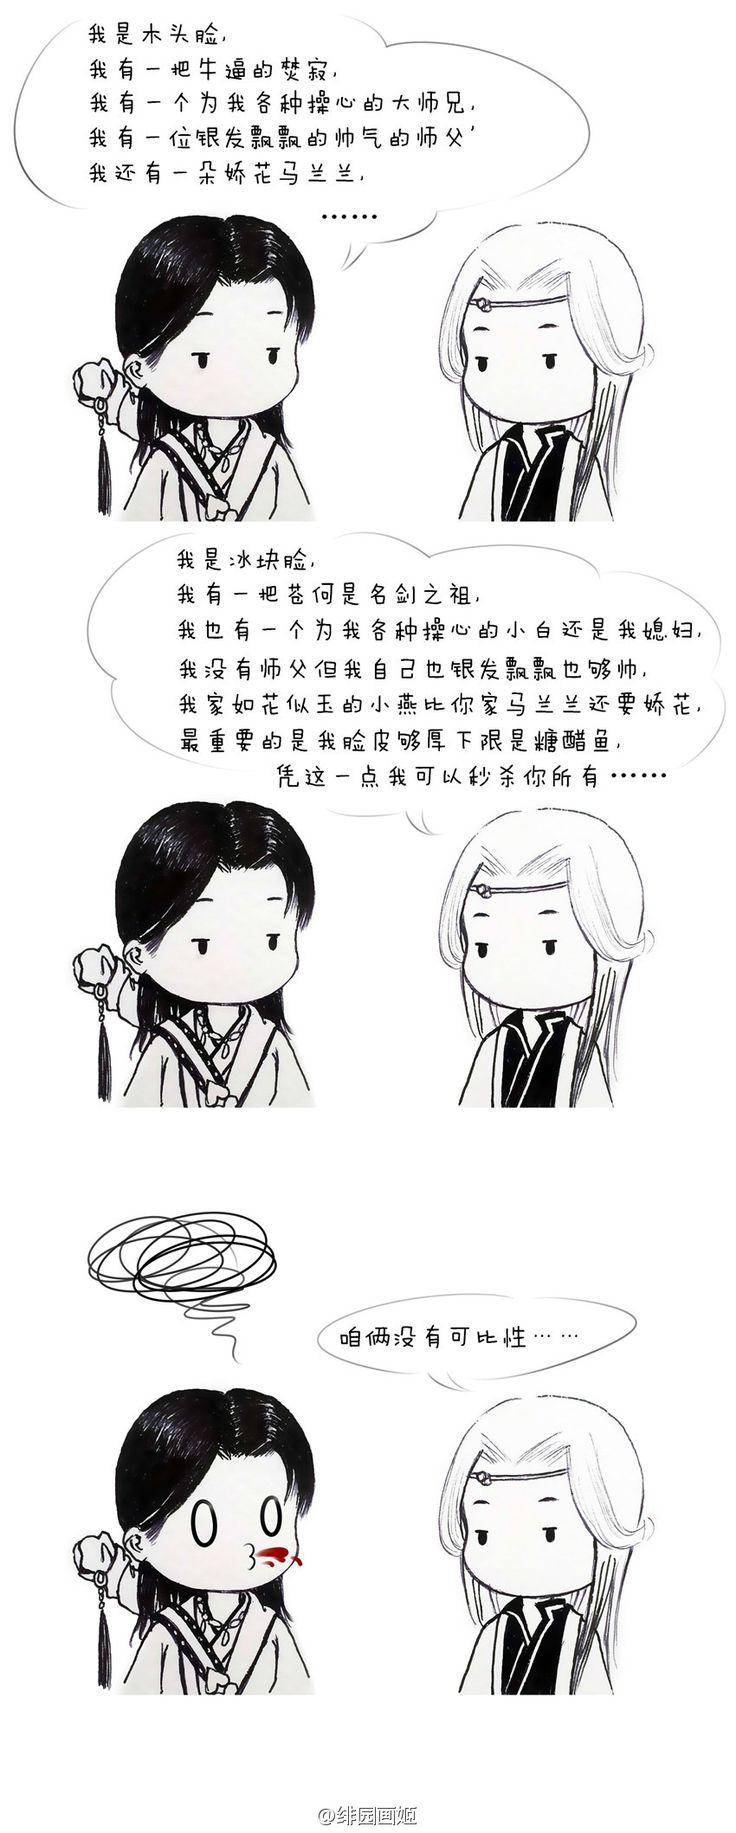 绯园画姬 's Weibo_Weibo